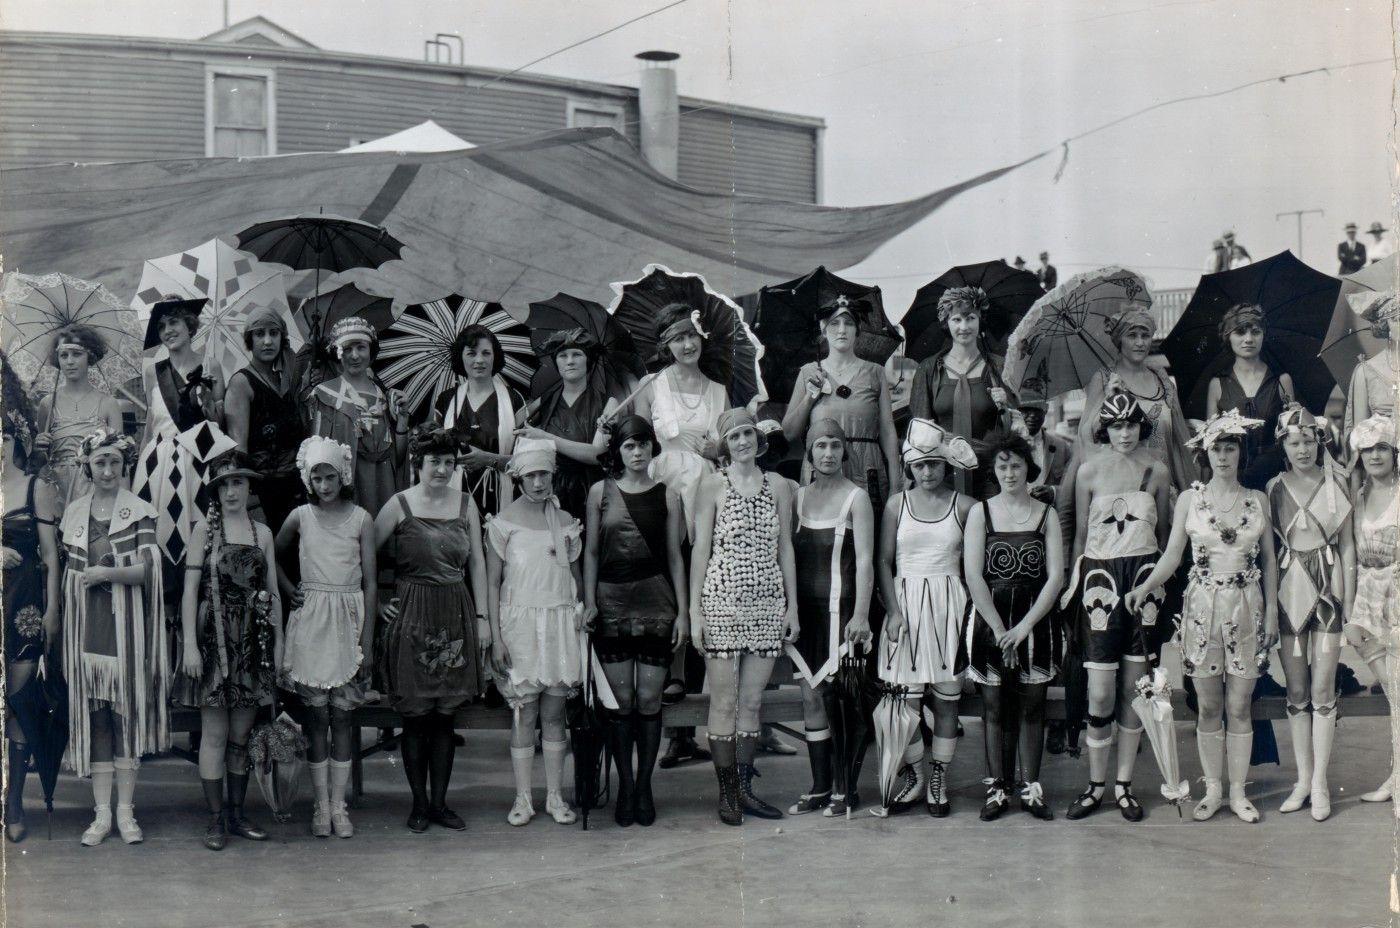 ecfaa5d81a Center detail) Contestants in the Bathing Girl Revue. Galveston ...